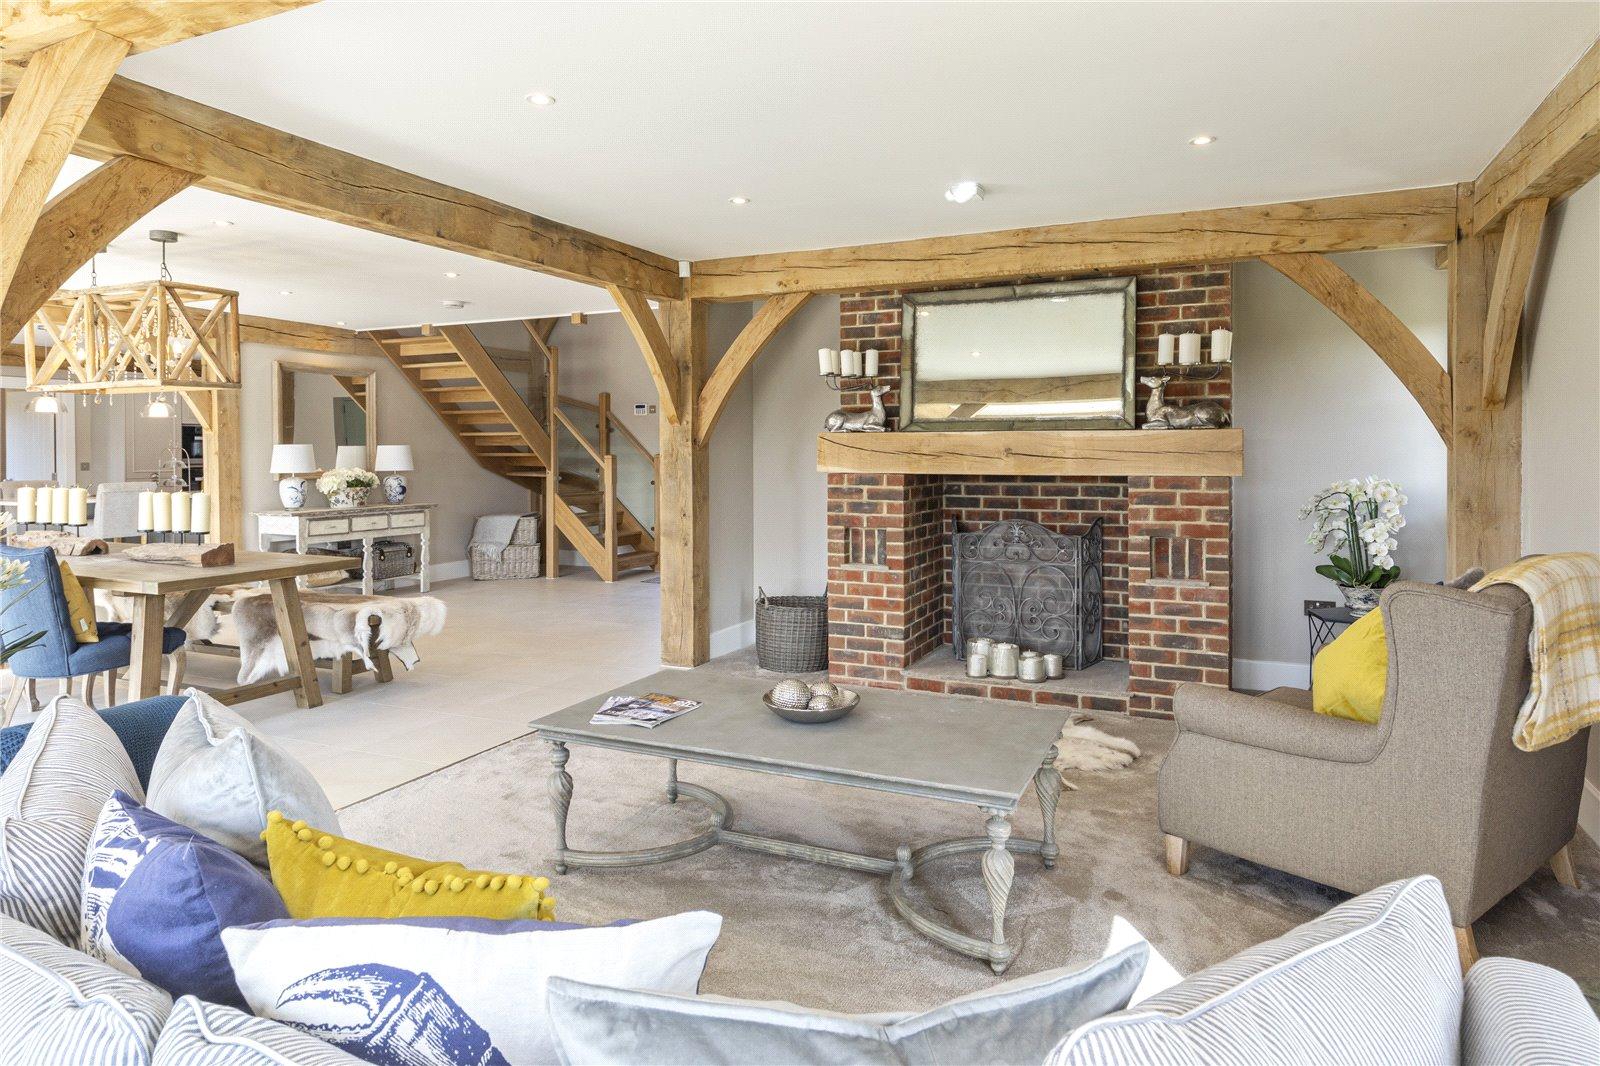 nordic ski lodge inspired interior design with brick fireplace